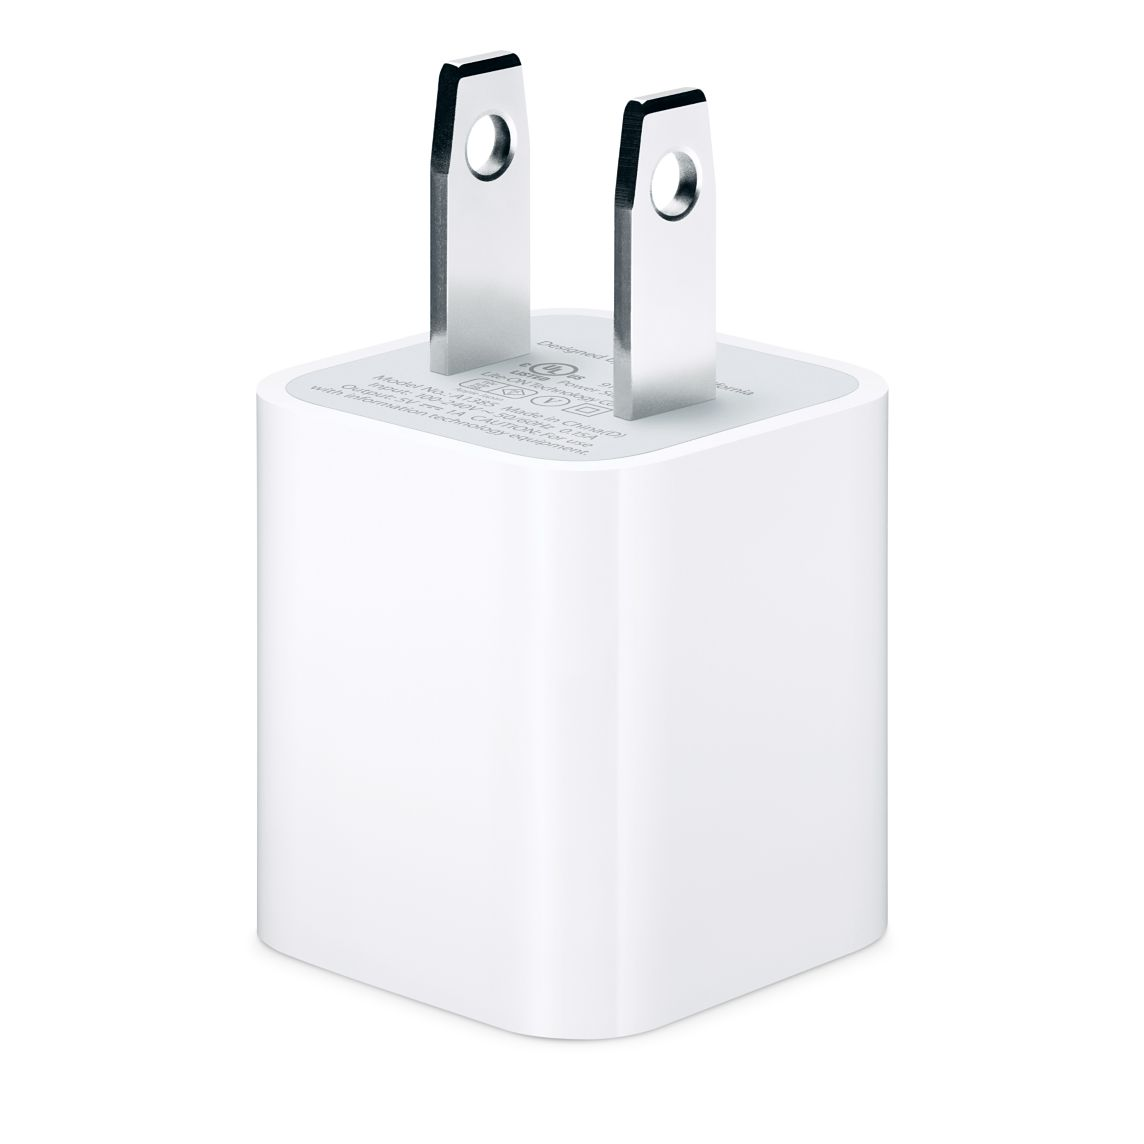 Sạc iPhone 5W USA